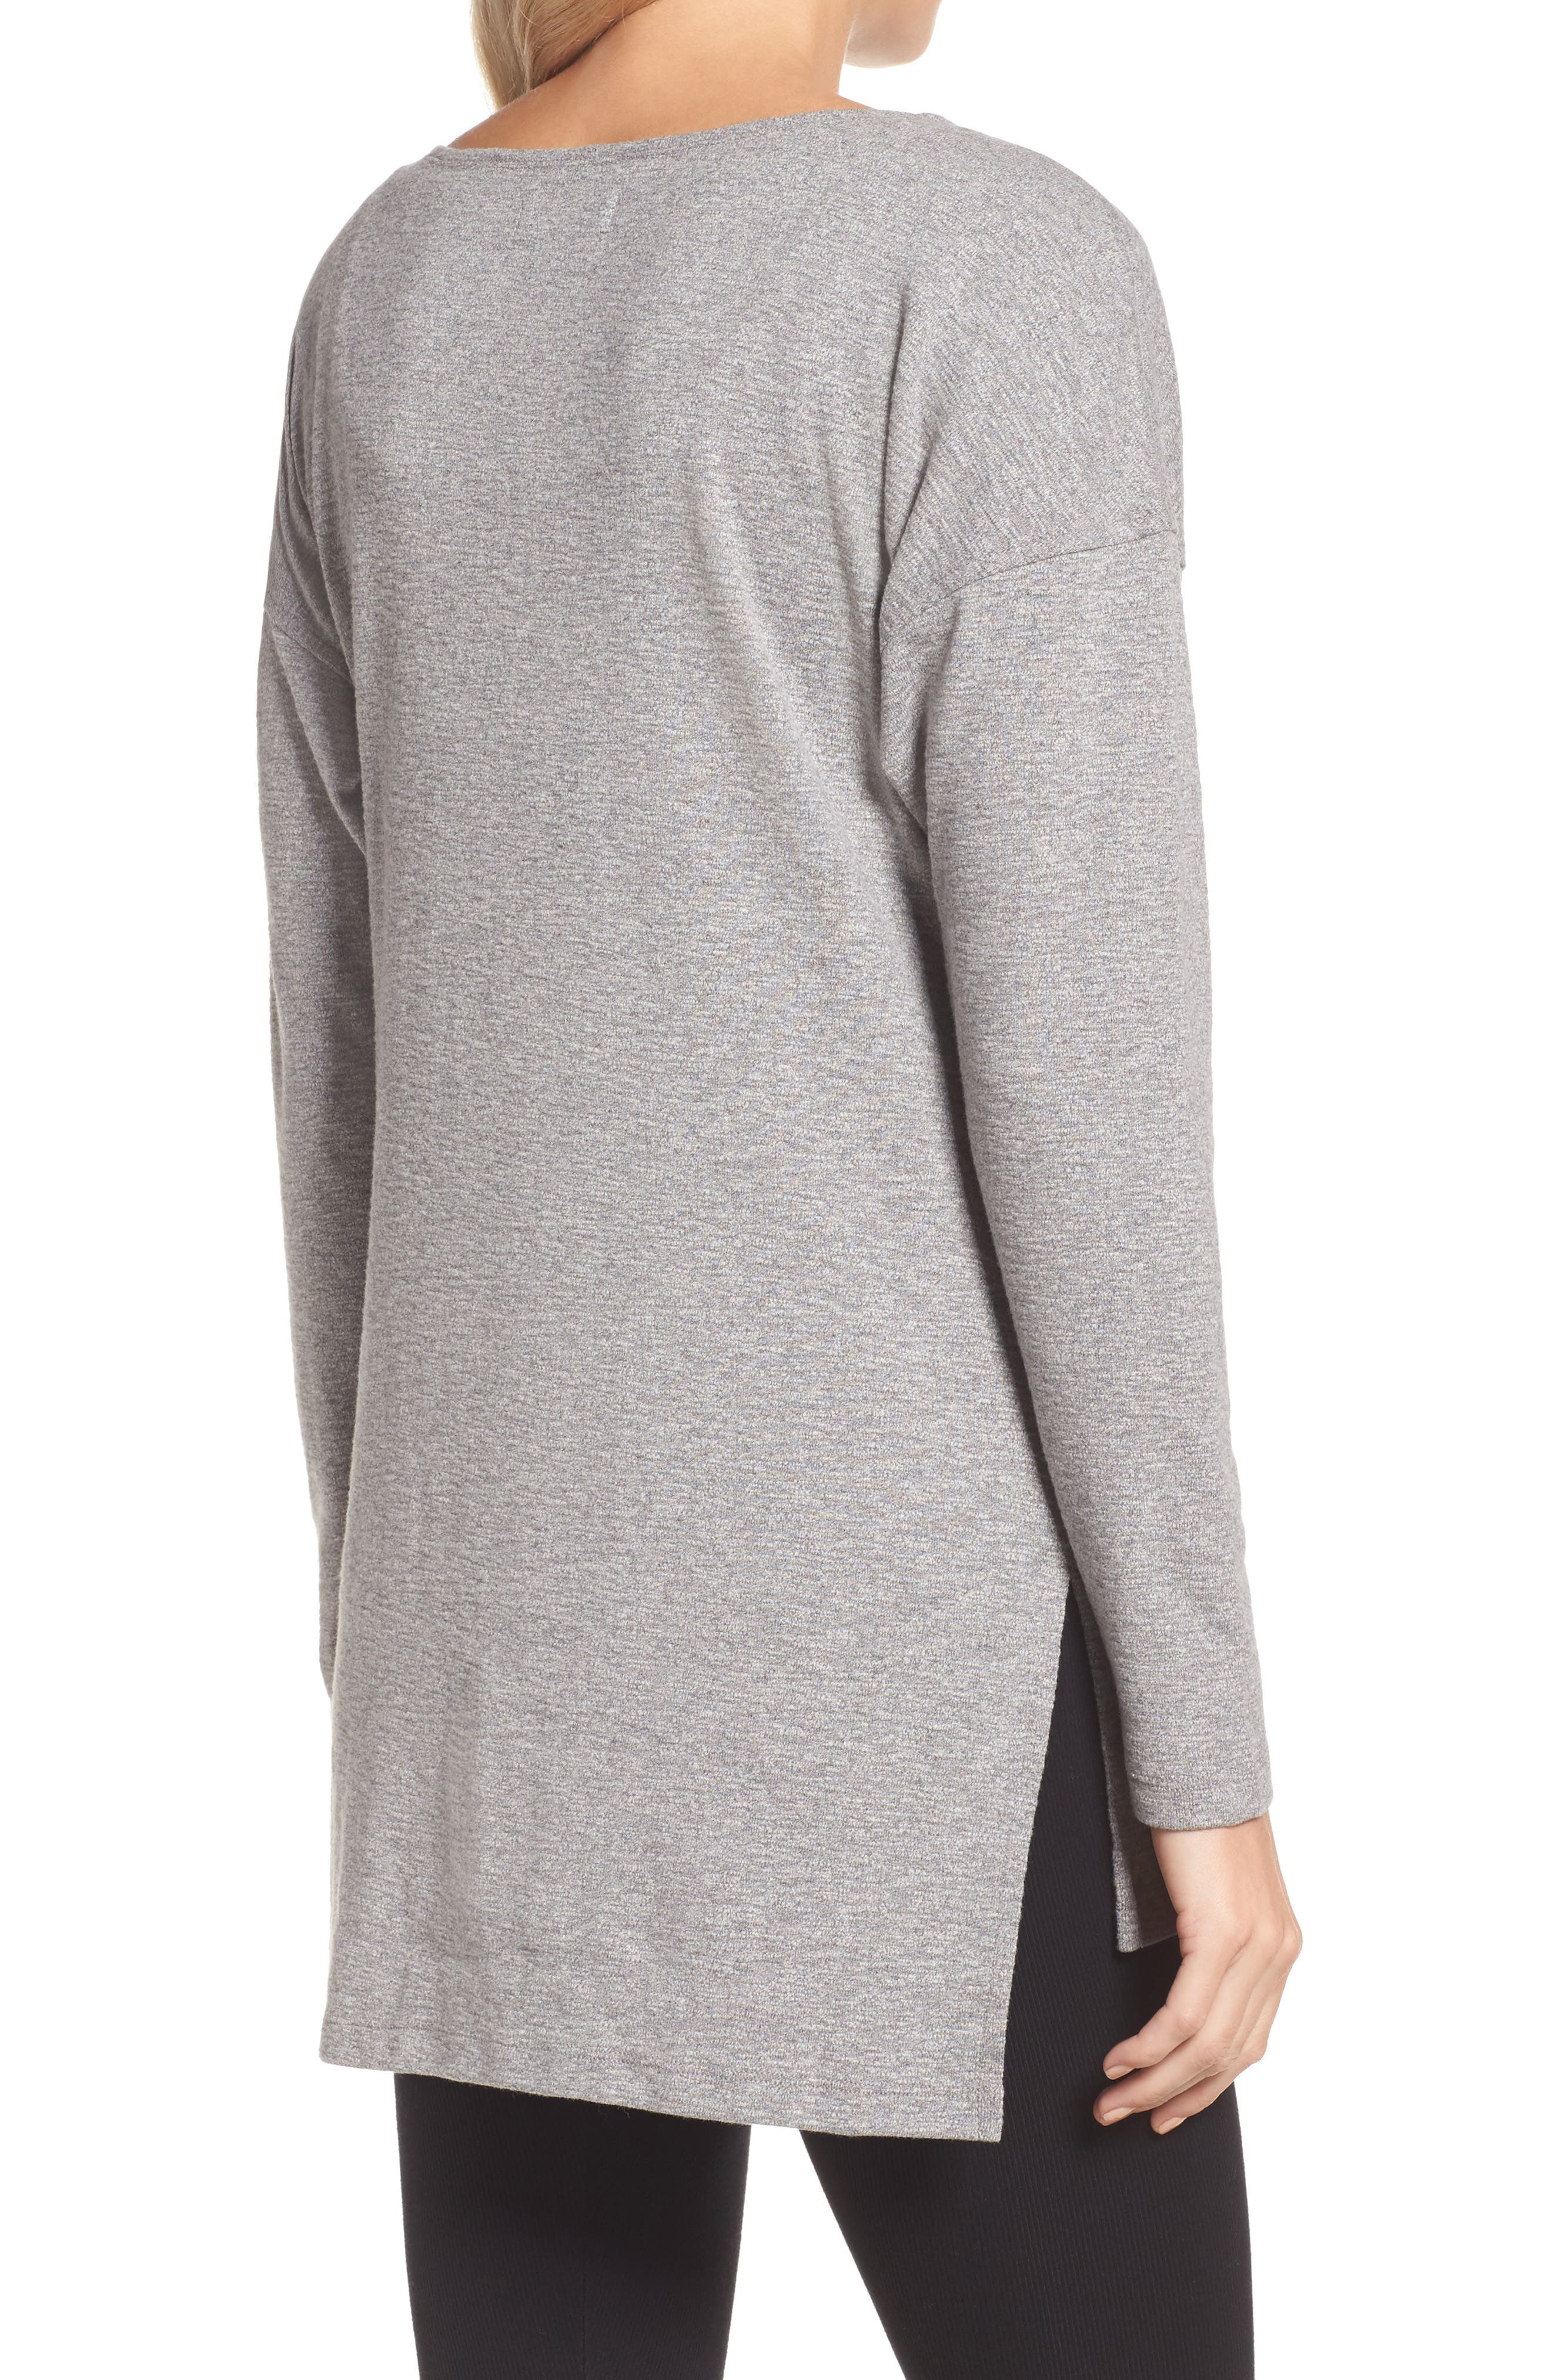 Luella High/Low Cotton Pullover,                             Alternate thumbnail 2, color,                             041